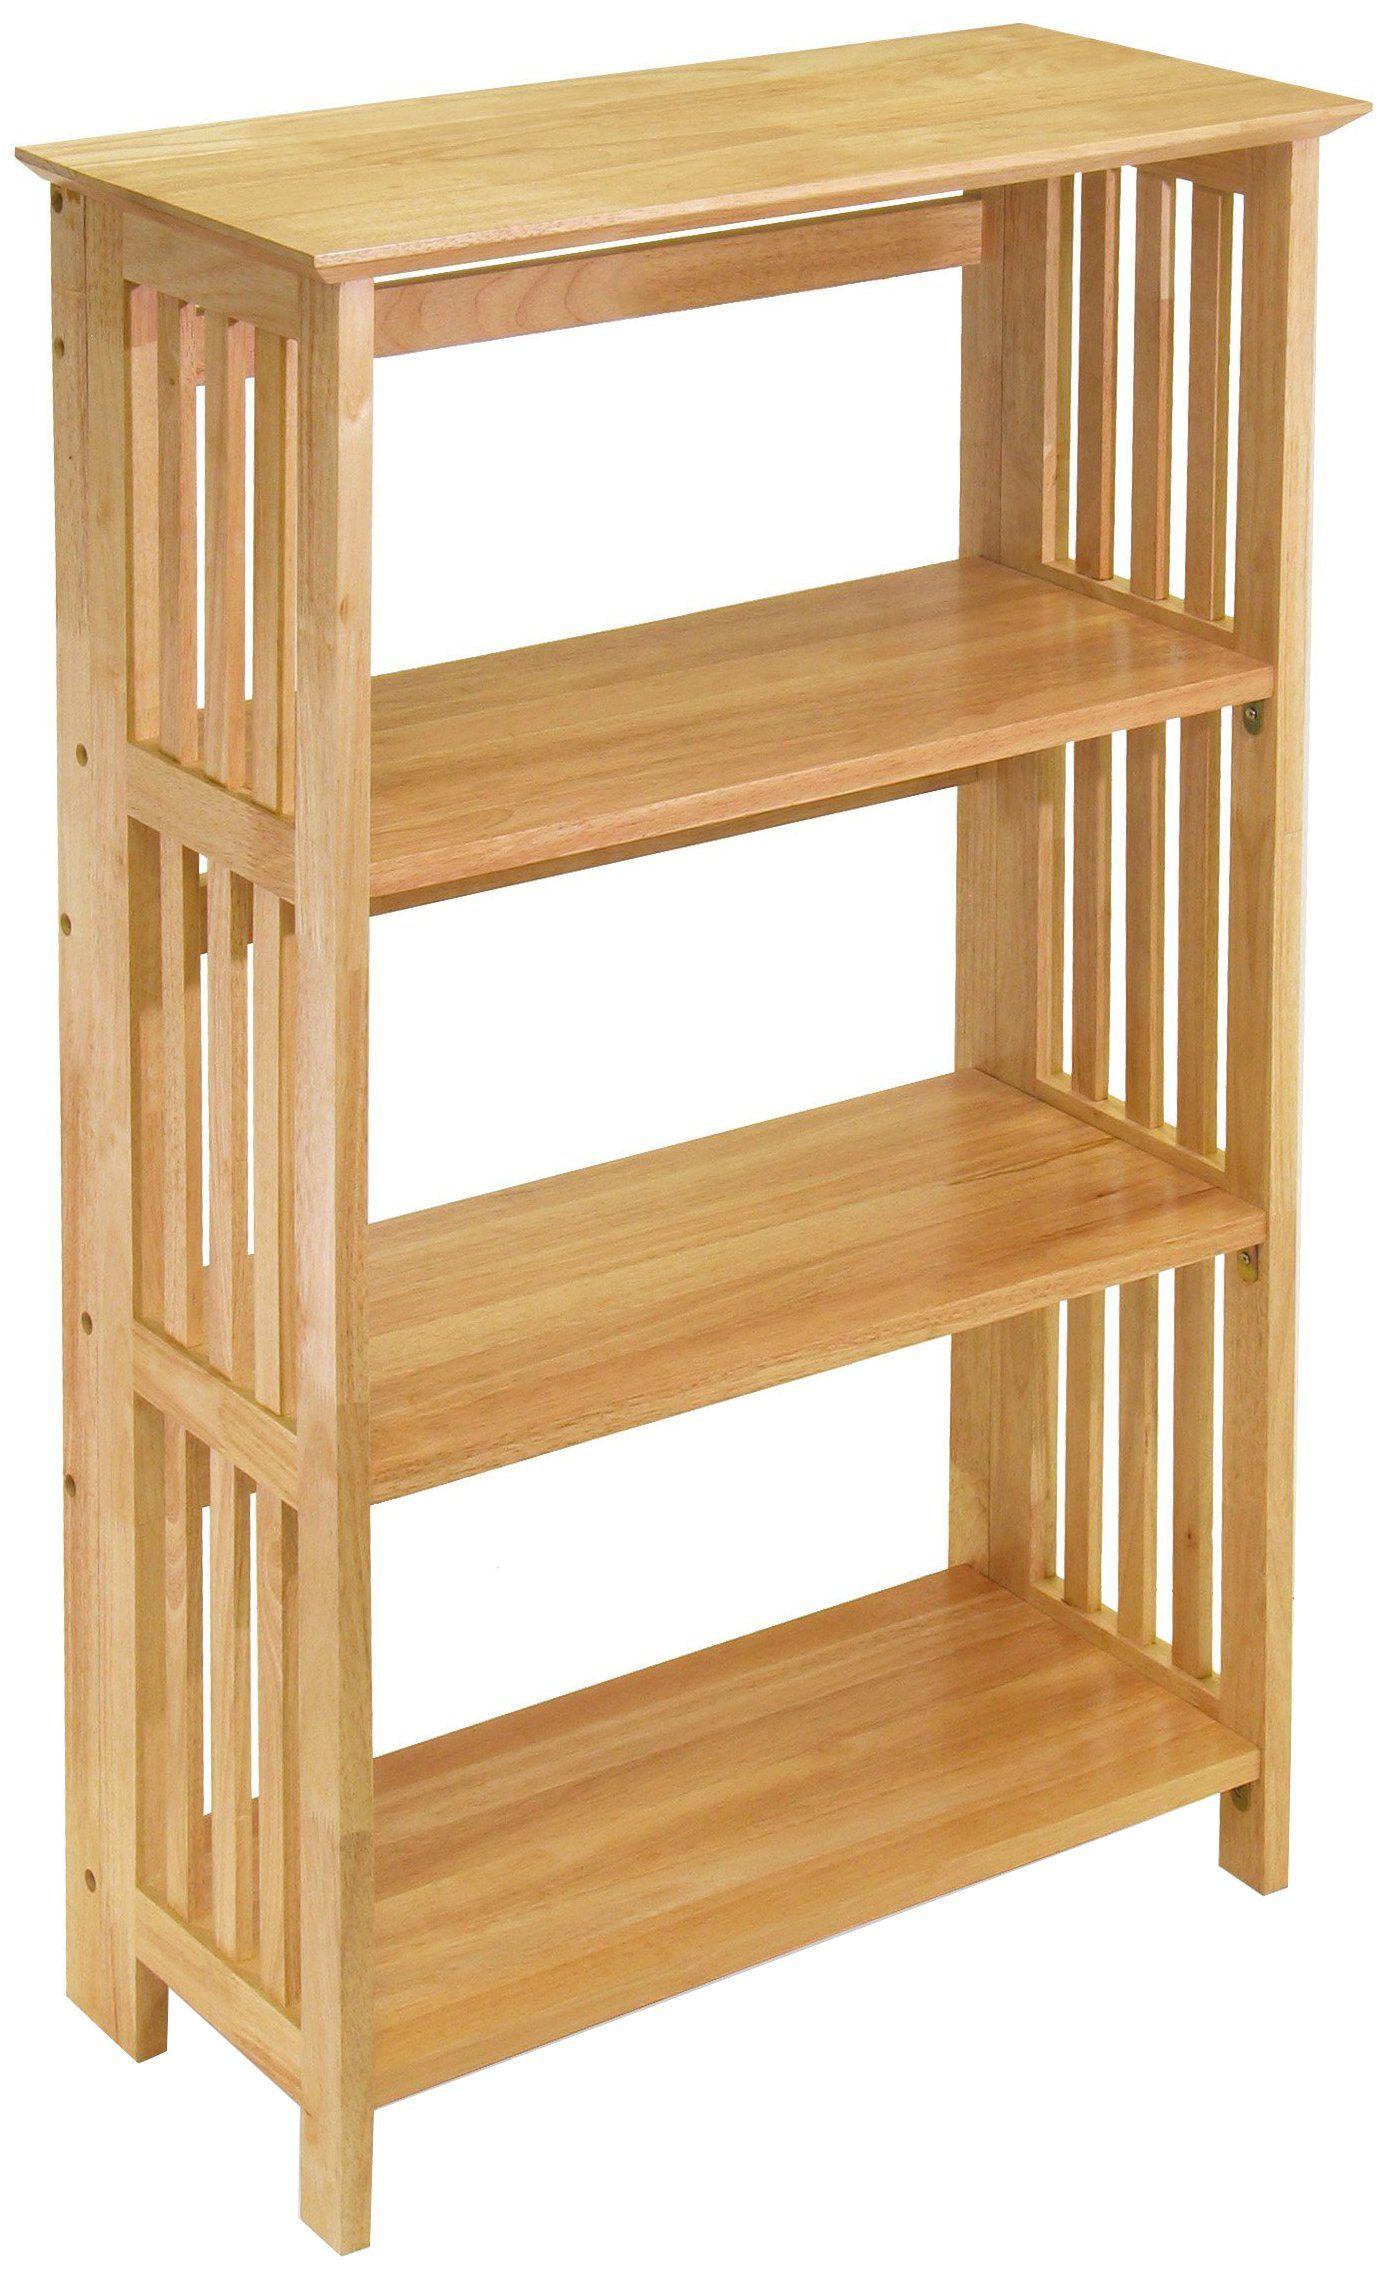 Winsome Wood Foldable Desk Natural Home Design Ideas